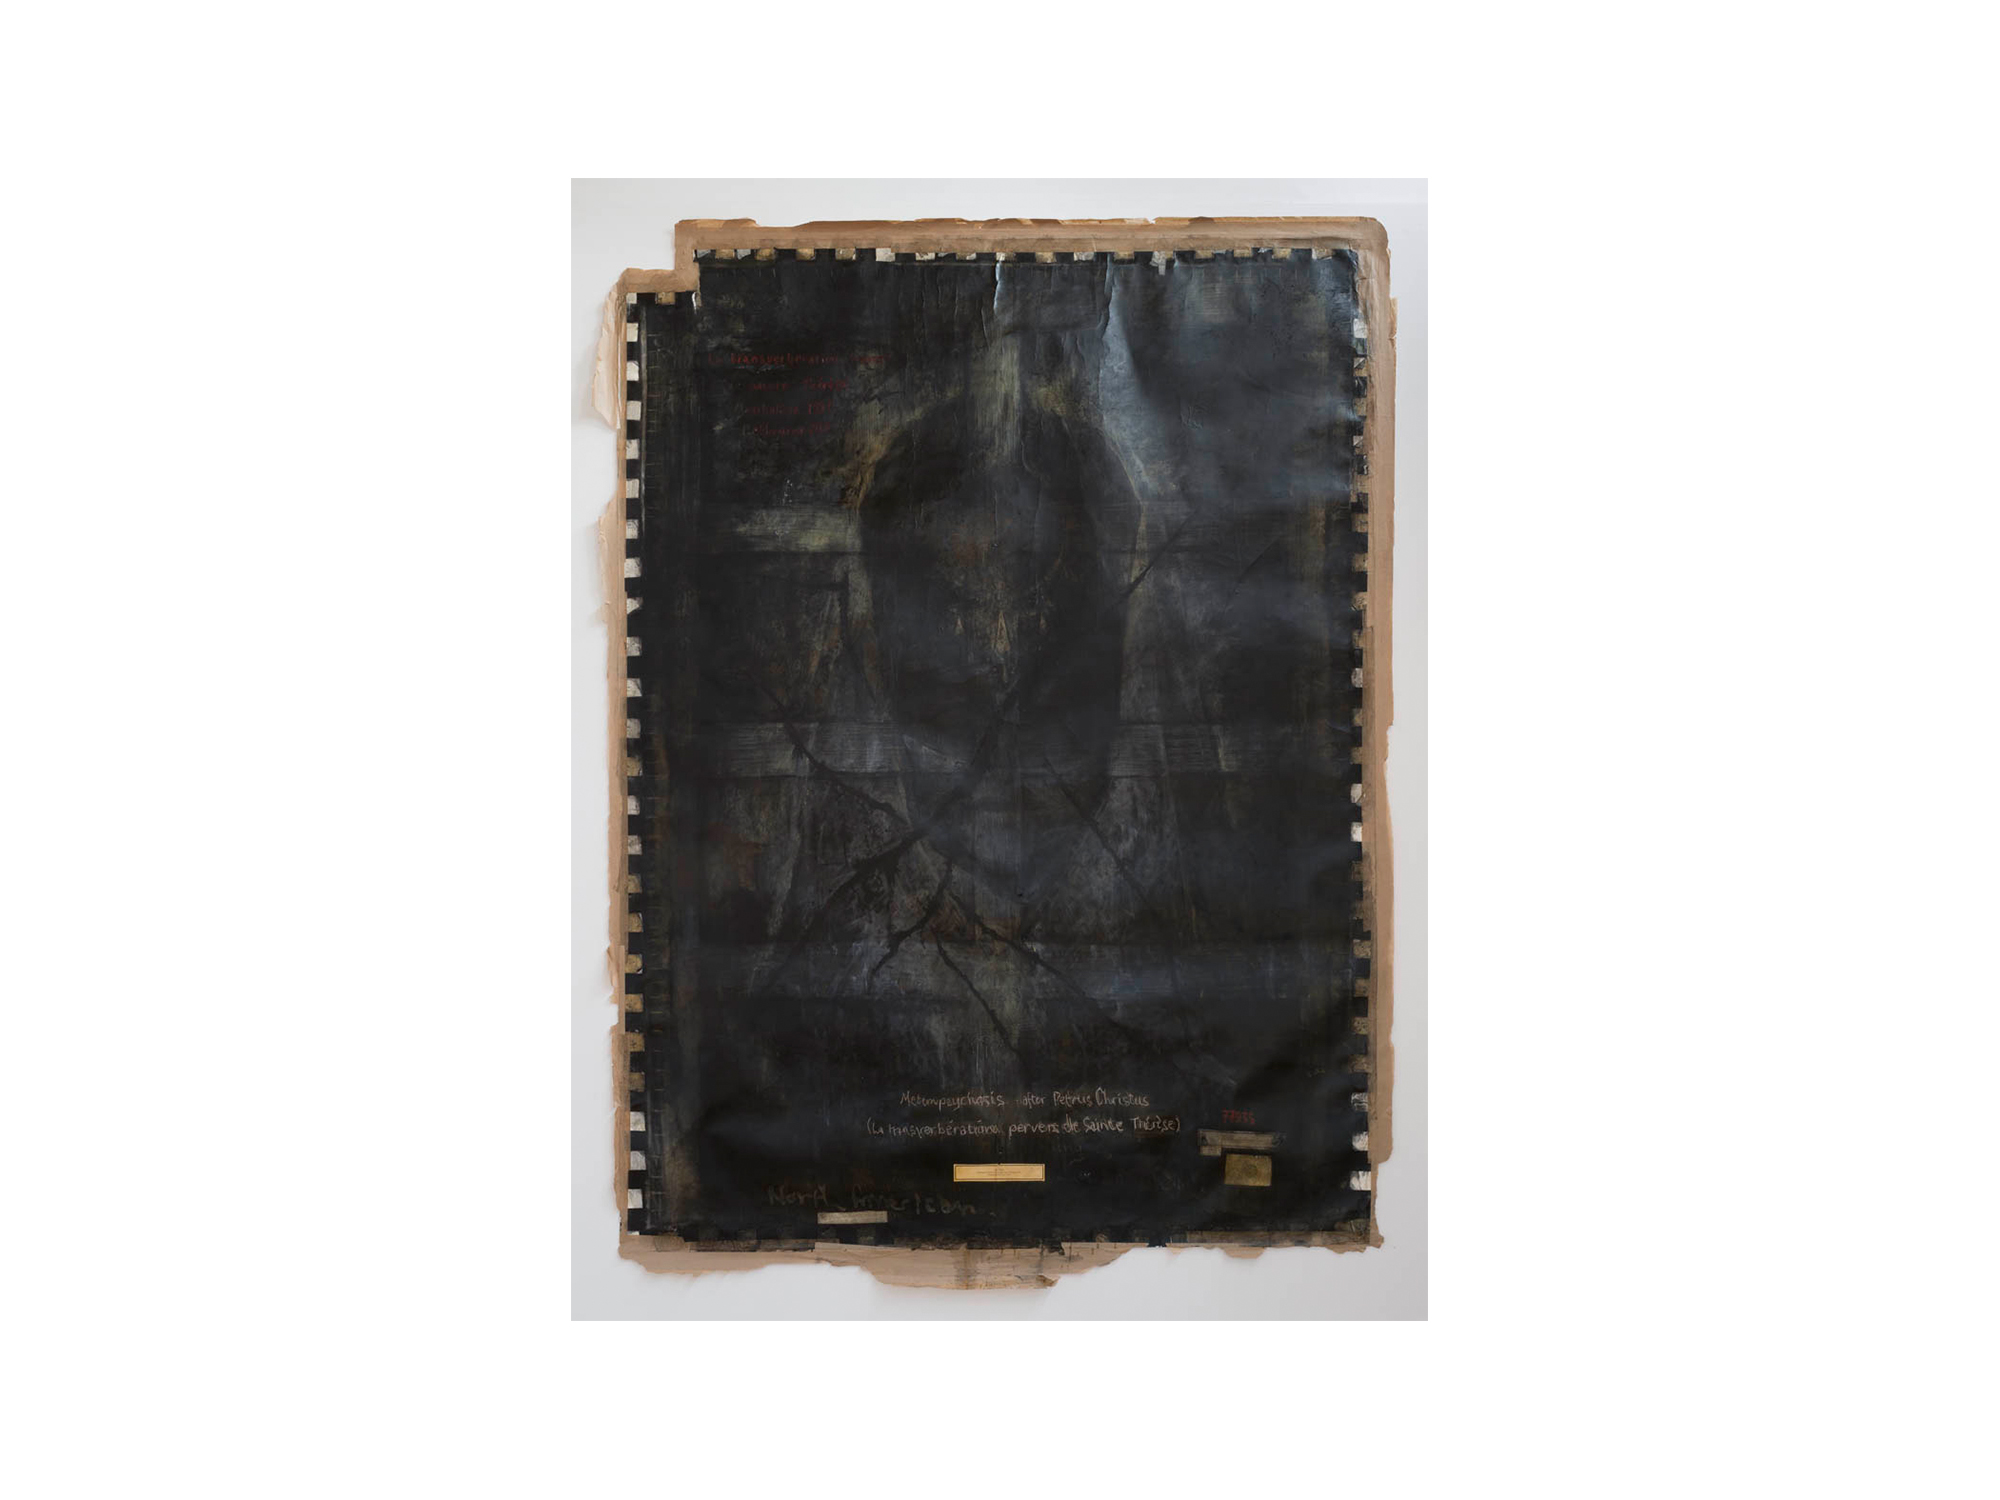 Bernhard Sachs   Metempsychosis After Petrus Christus (La trasverberation pervers de Sainte Therese) Manhattan 1994 - Melbourne 2016 , 2016 charcoal, acrylic on paper 290 x 212c   ARTIST BIO